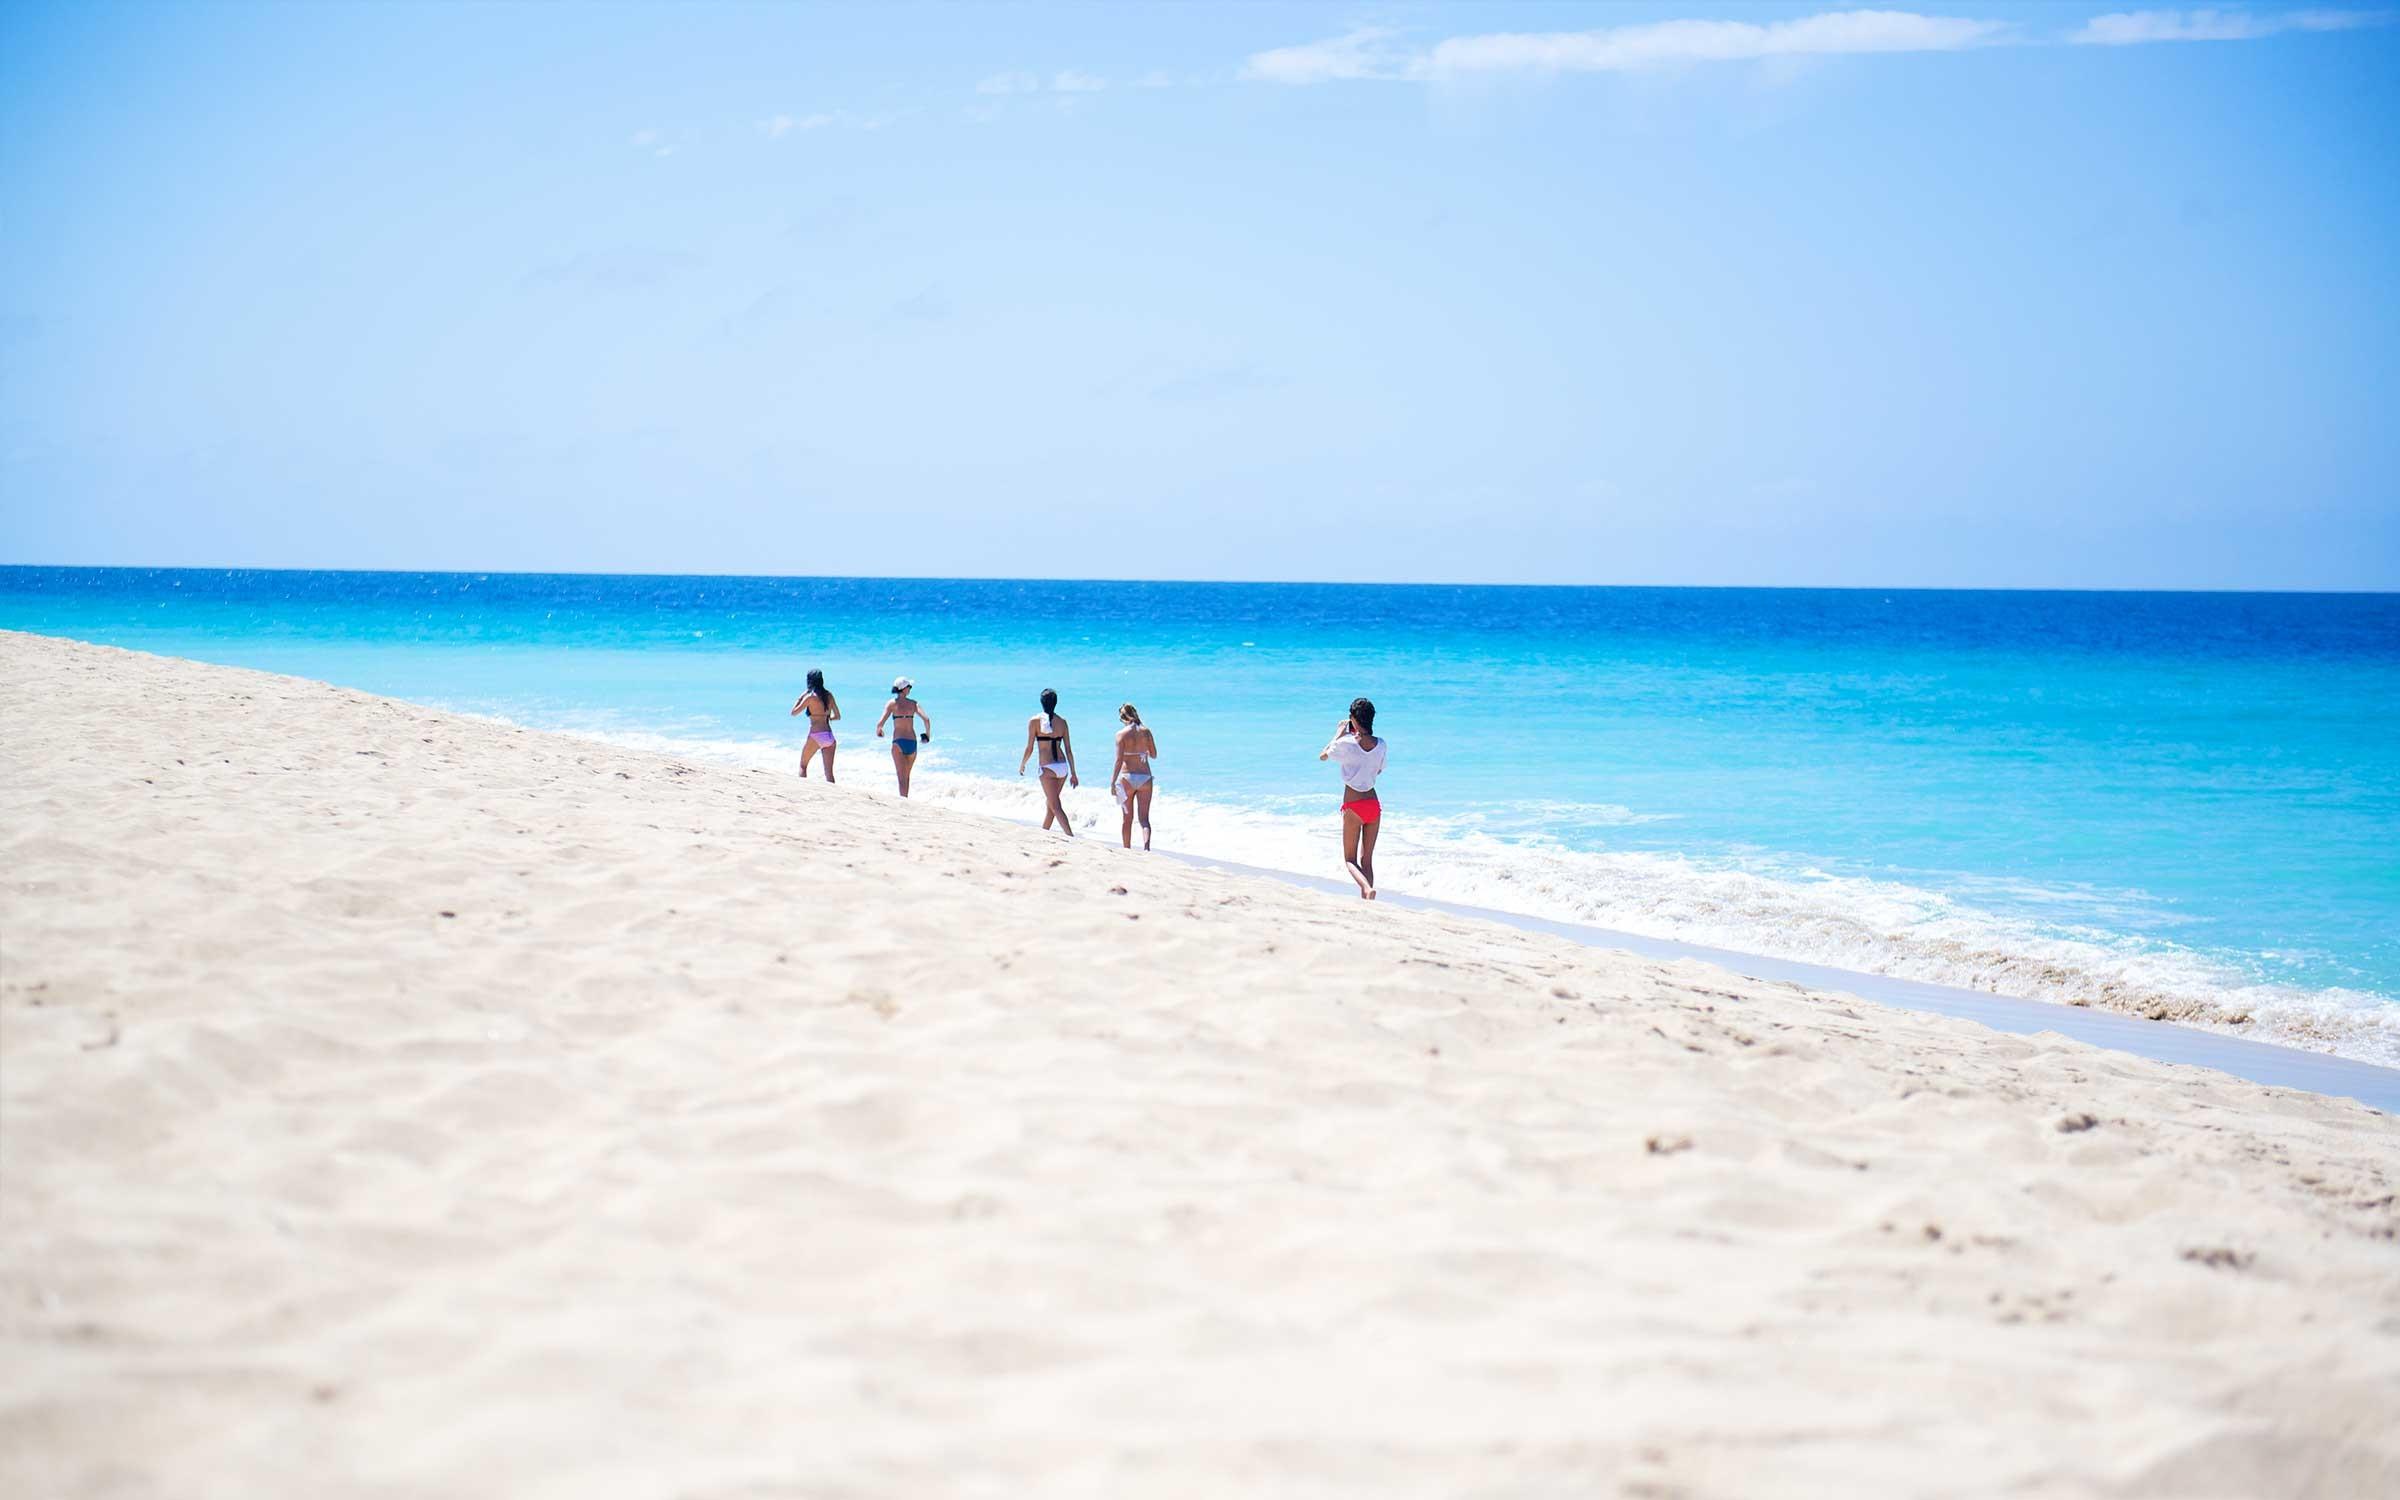 Caribbean Wallpaper Wednesday: Exclusive Sandy Point Beach | St. Croix,  U.S. Virgin Islands |